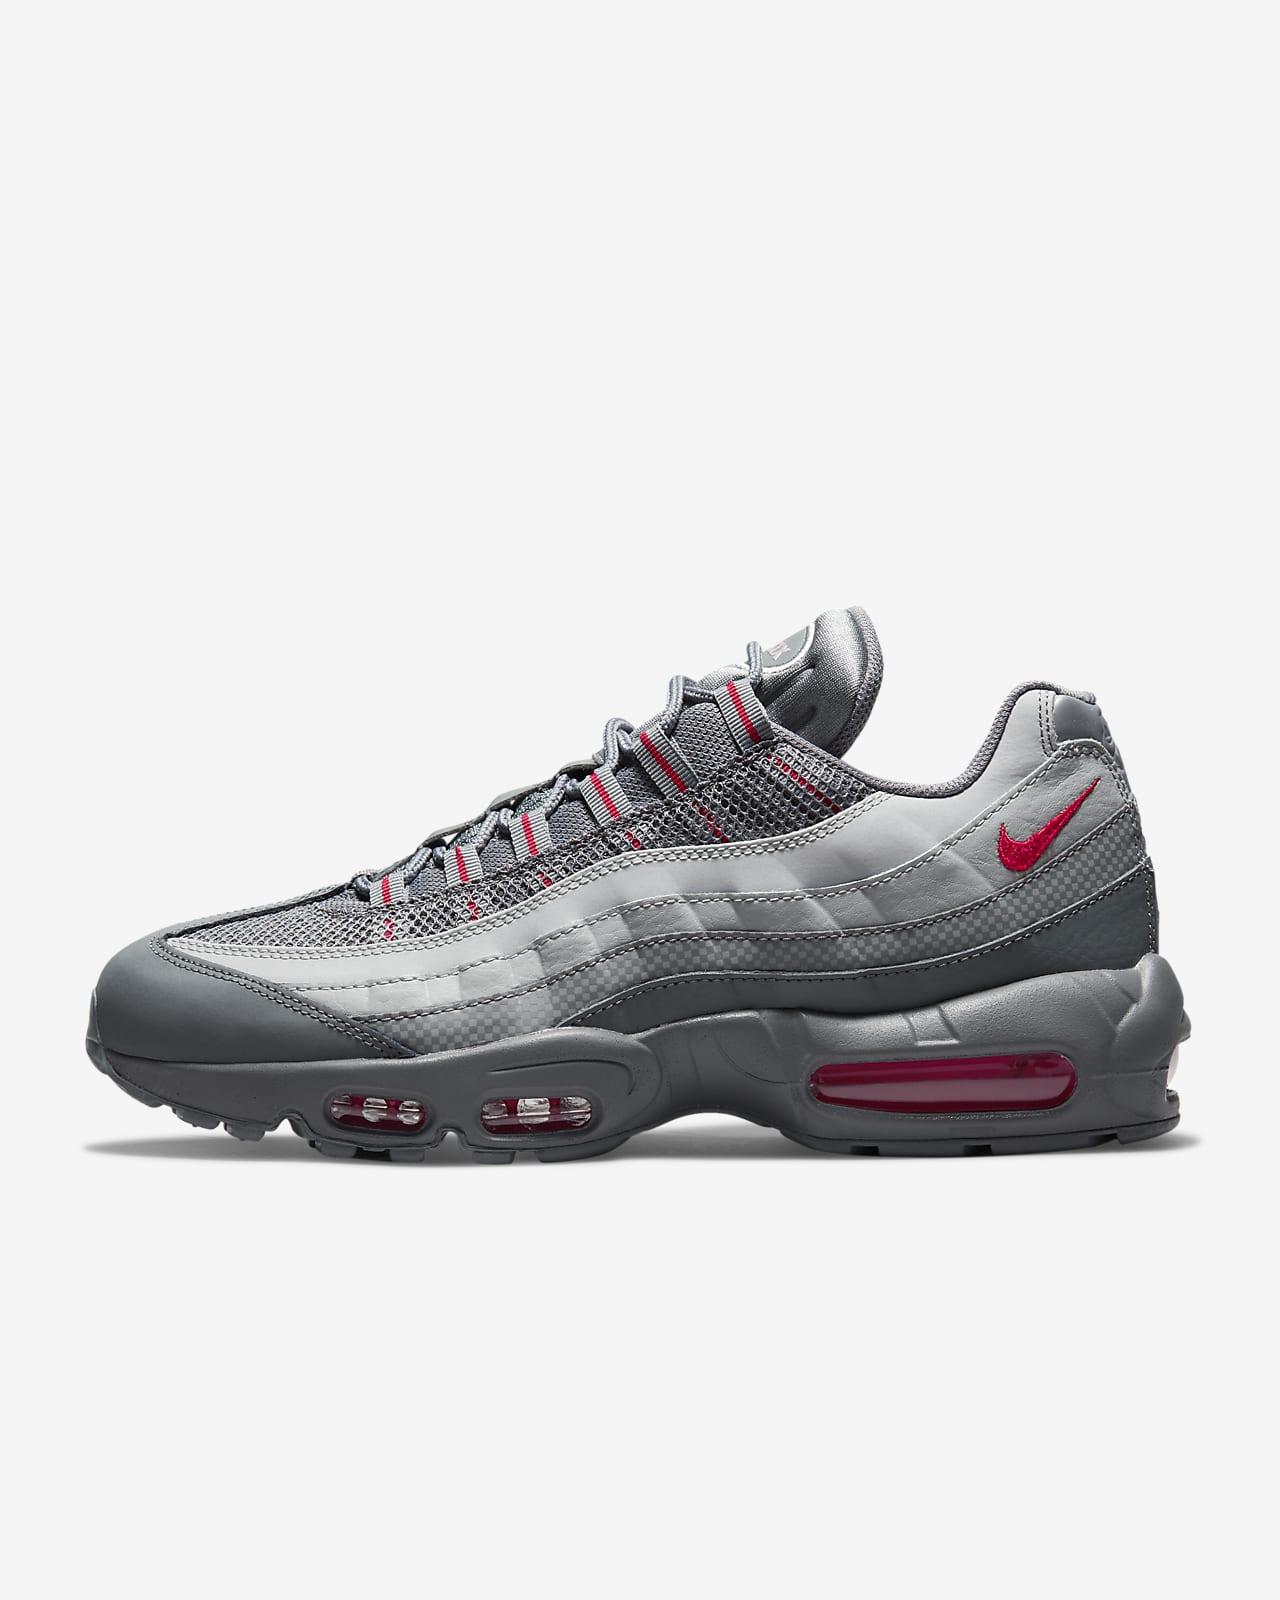 Nike Air Max 95 Essential Men's Shoes